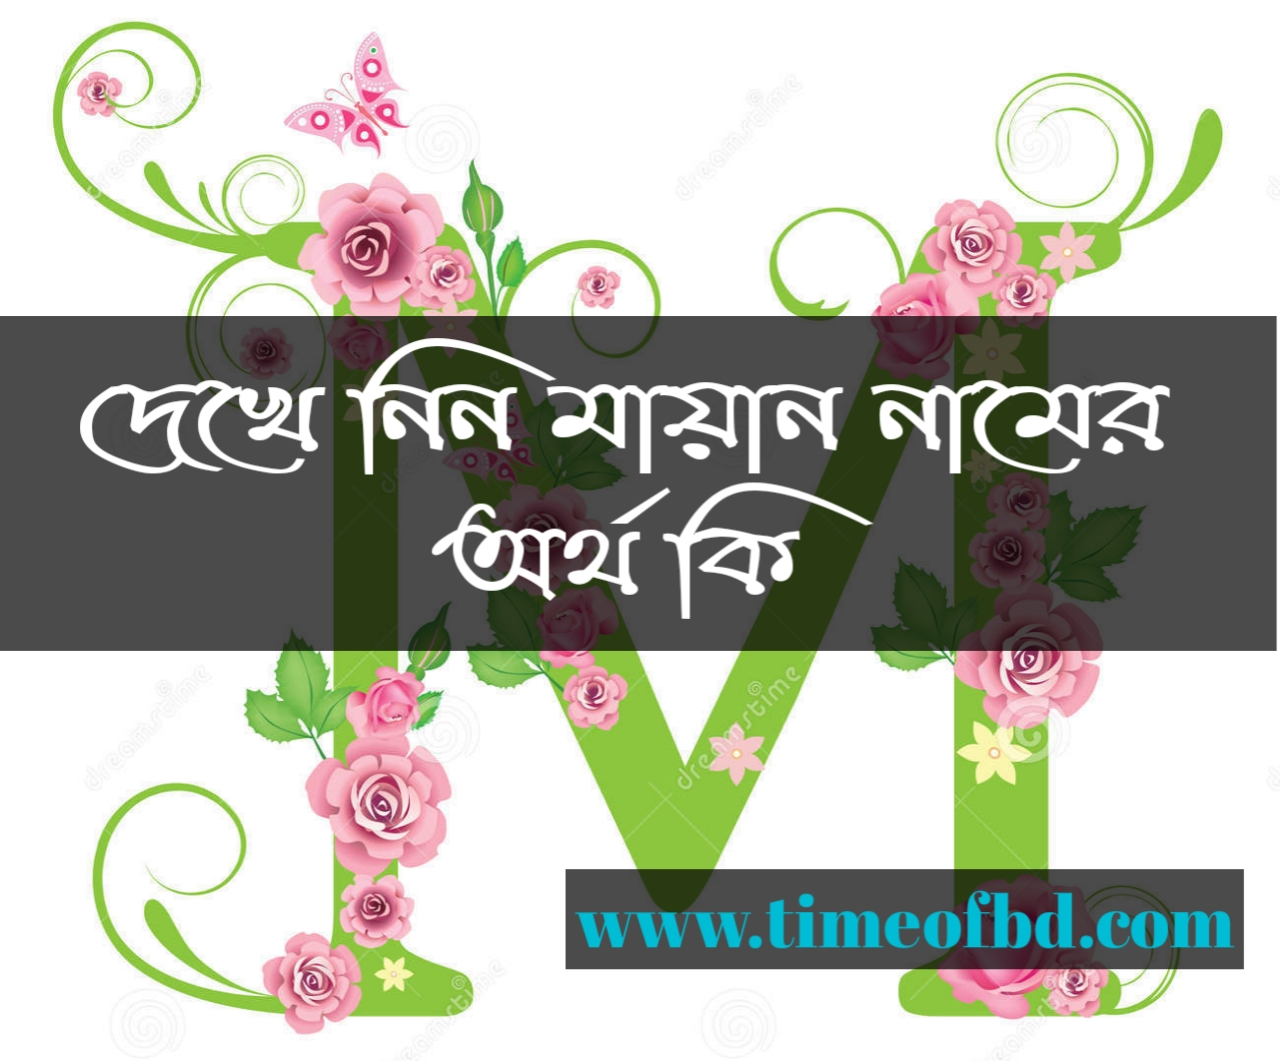 mayan name meaning in Bengali, মায়ান নামের অর্থ কি, মায়ান নামের বাংলা অর্থ কি, মায়ান নামের ইসলামিক অর্থ কি,